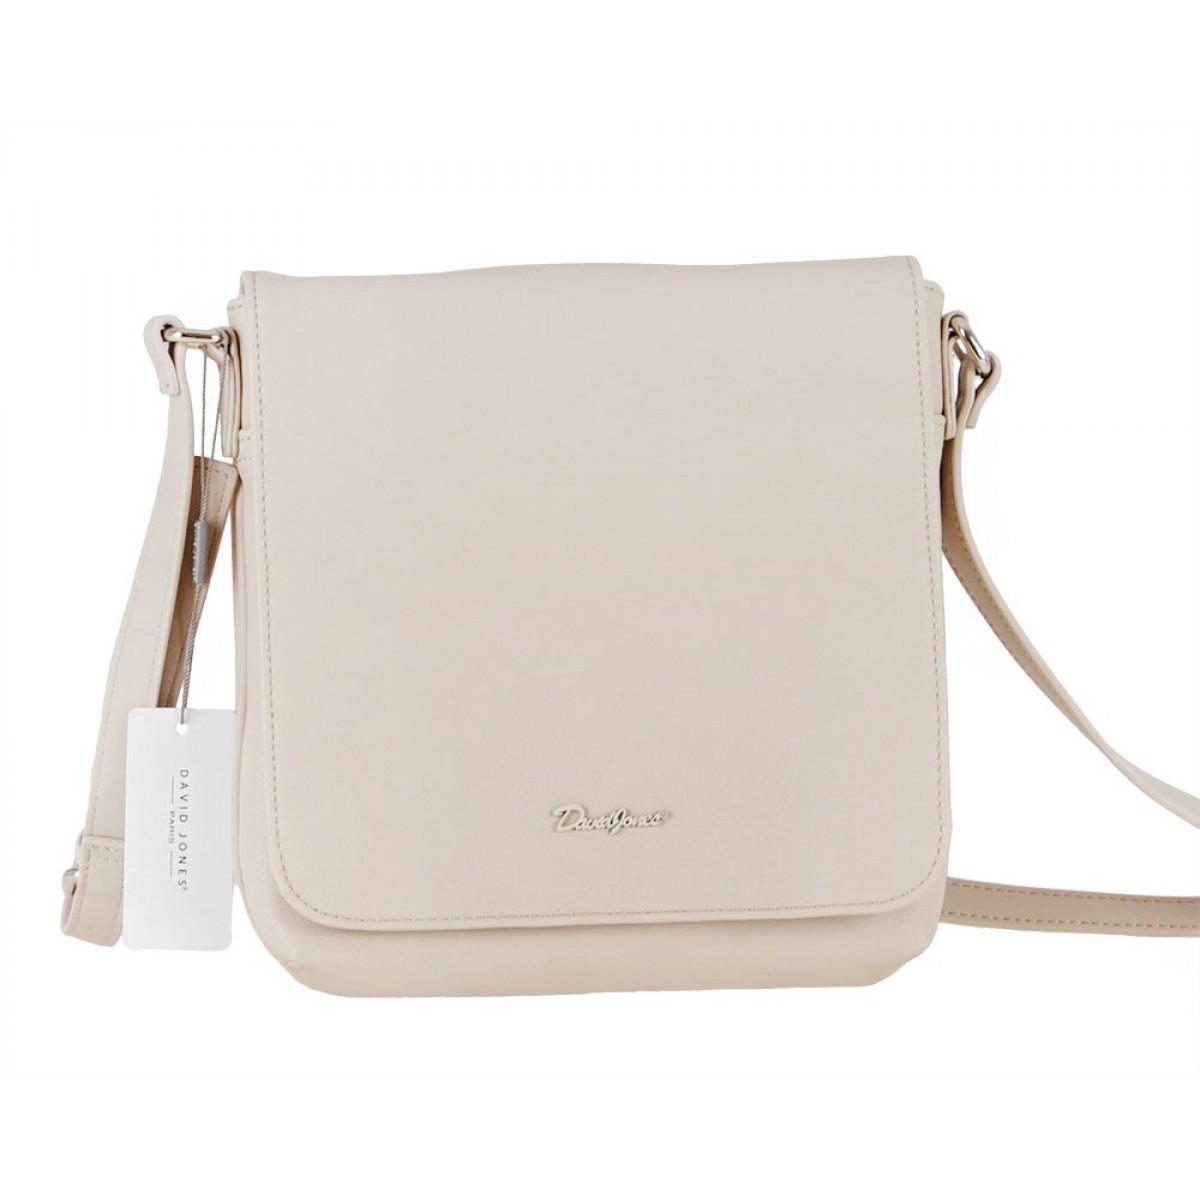 Жіноча сумка David Jones 6511-2 BEIGE